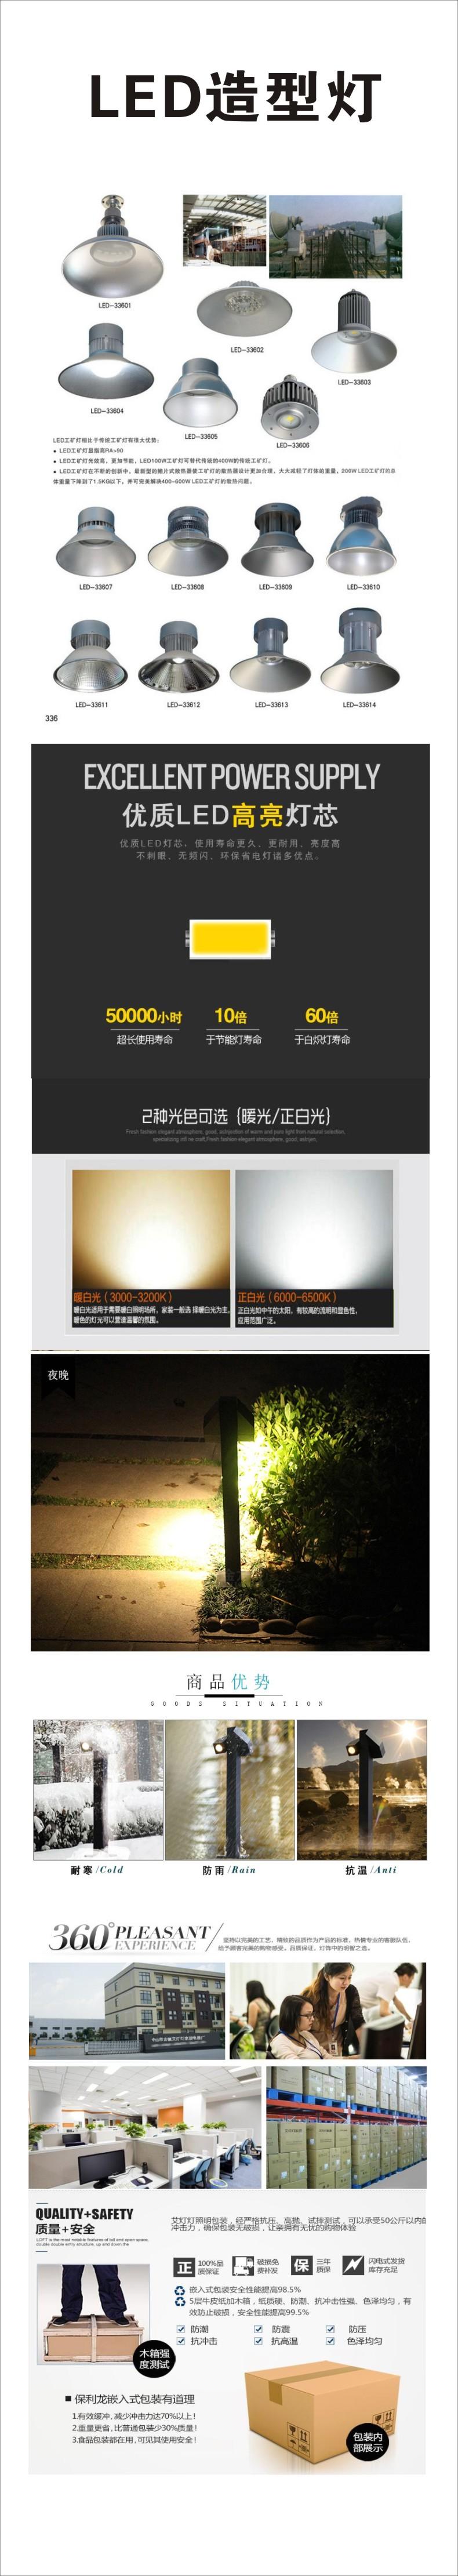 云南LED路灯yngfld01